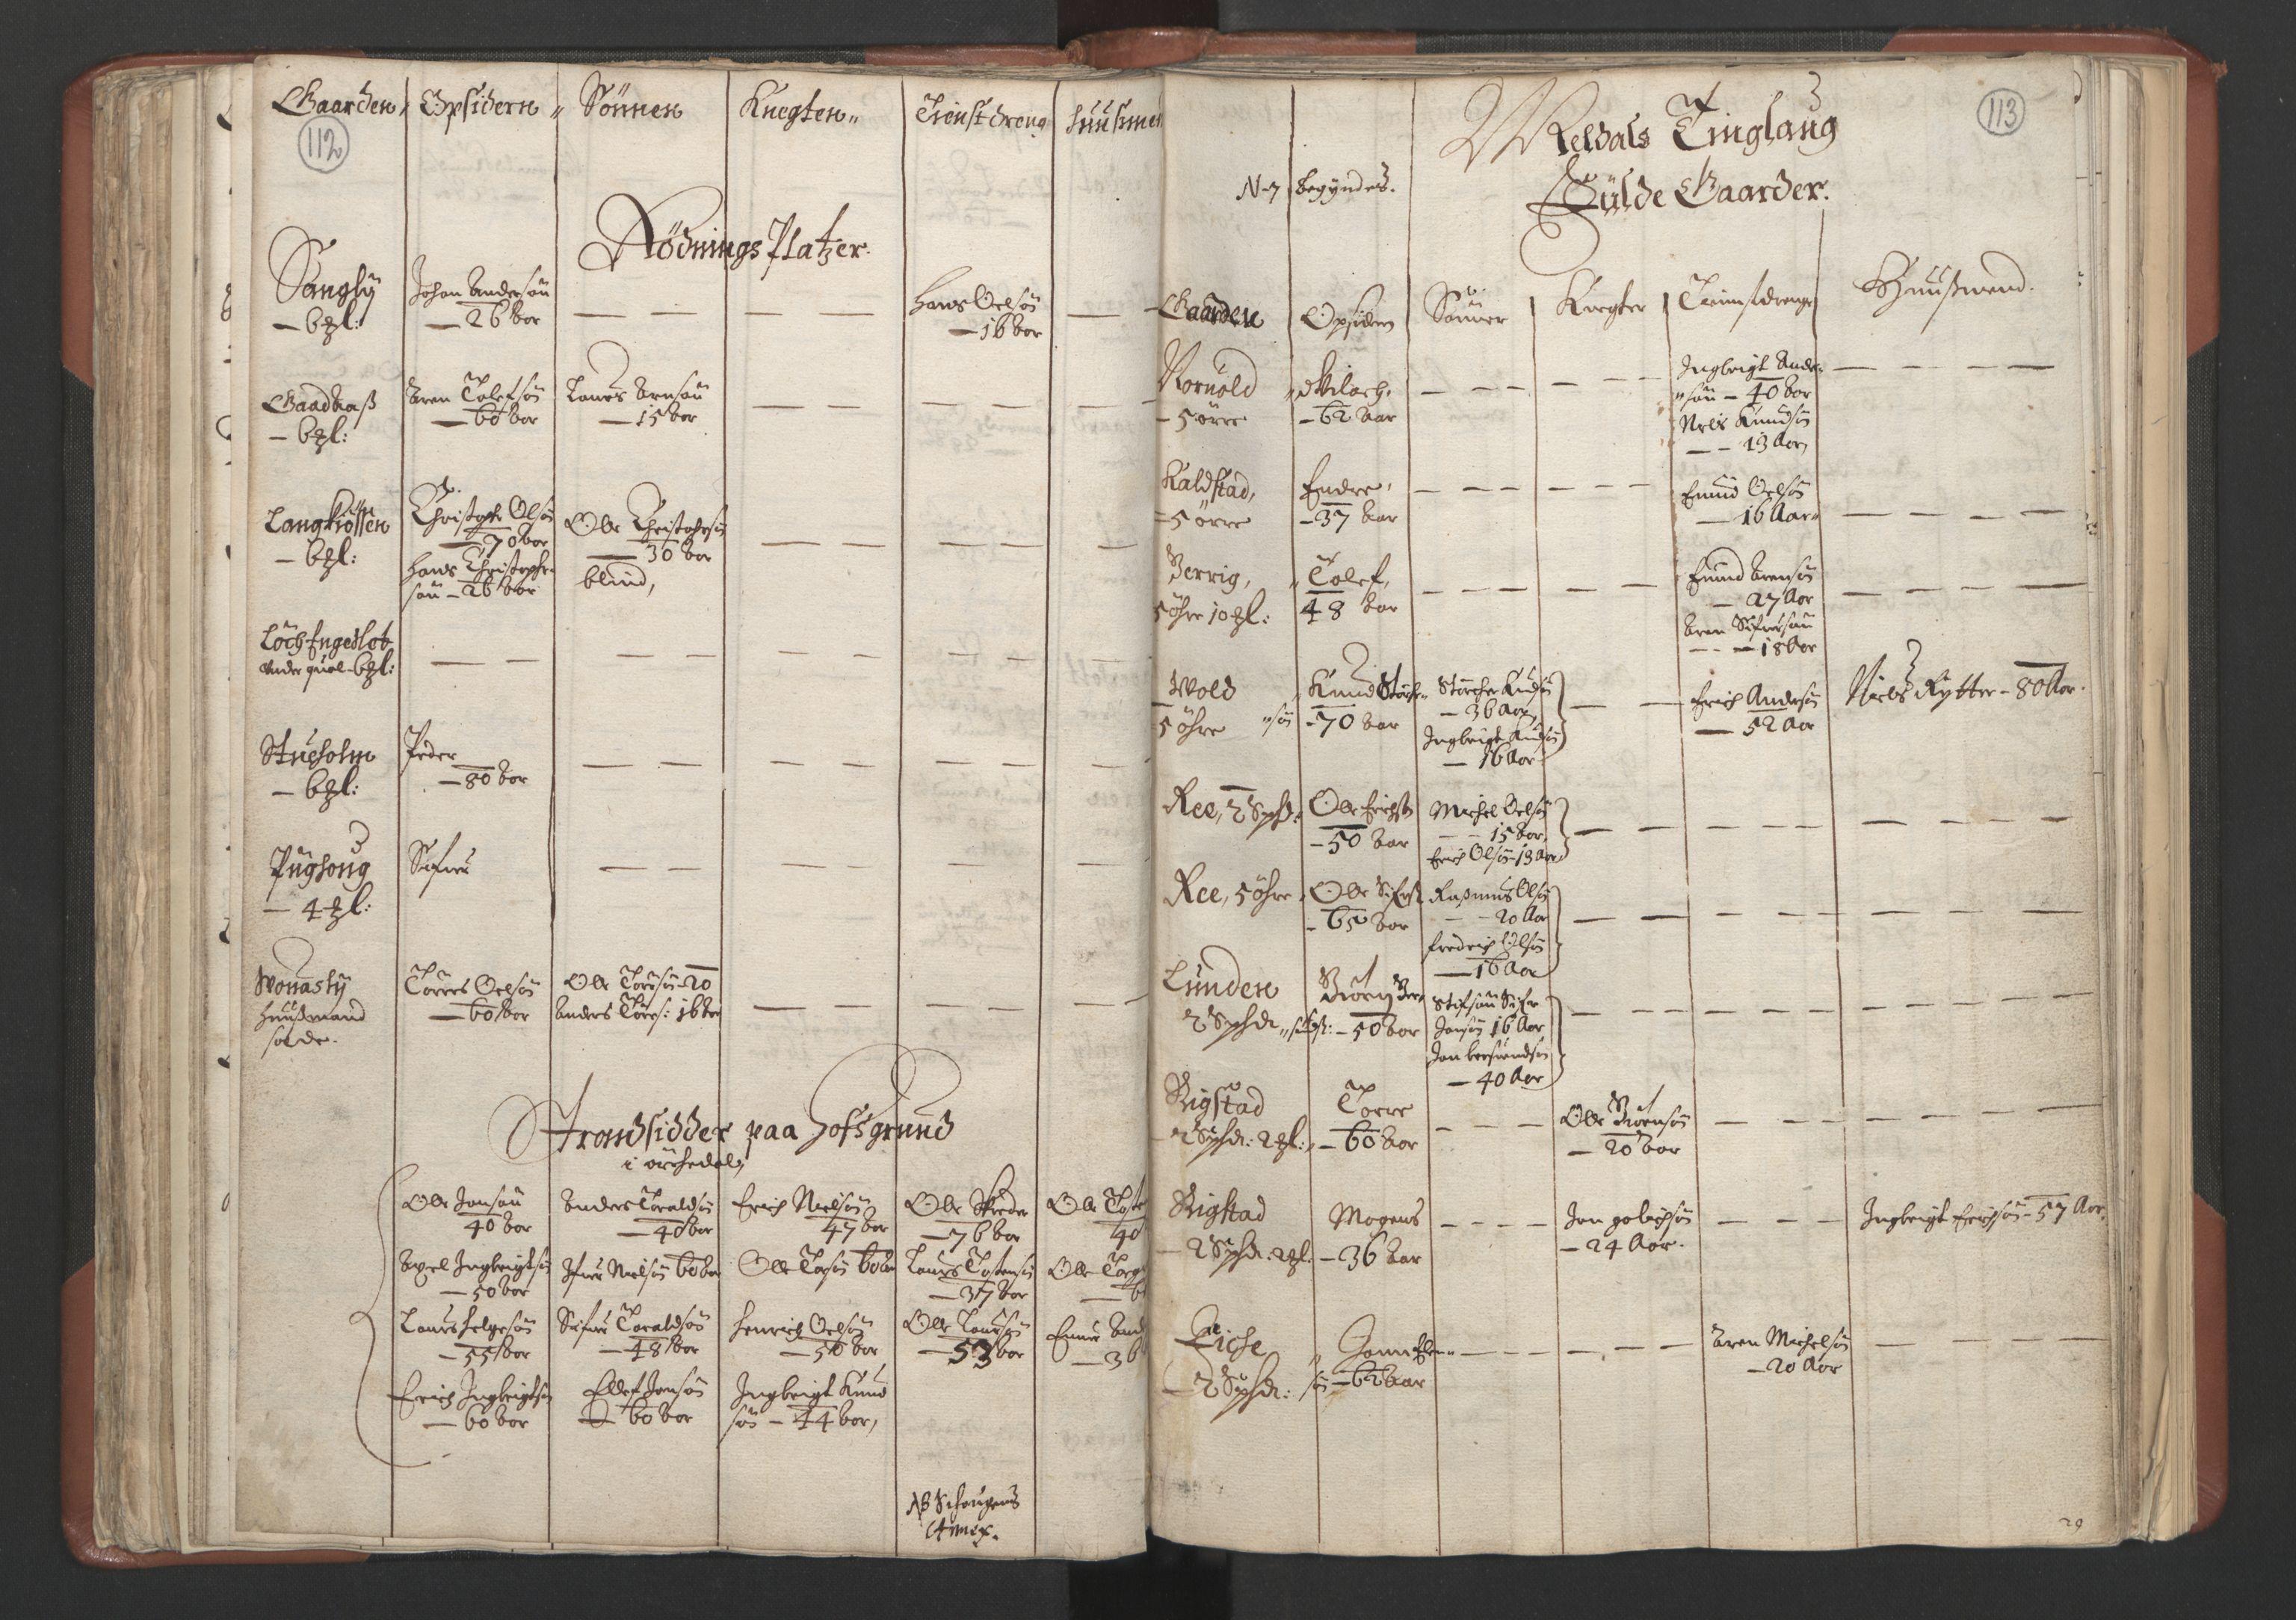 RA, Fogdenes og sorenskrivernes manntall 1664-1666, nr. 18: Gauldal fogderi, Strinda fogderi og Orkdal fogderi, 1664, s. 112-113